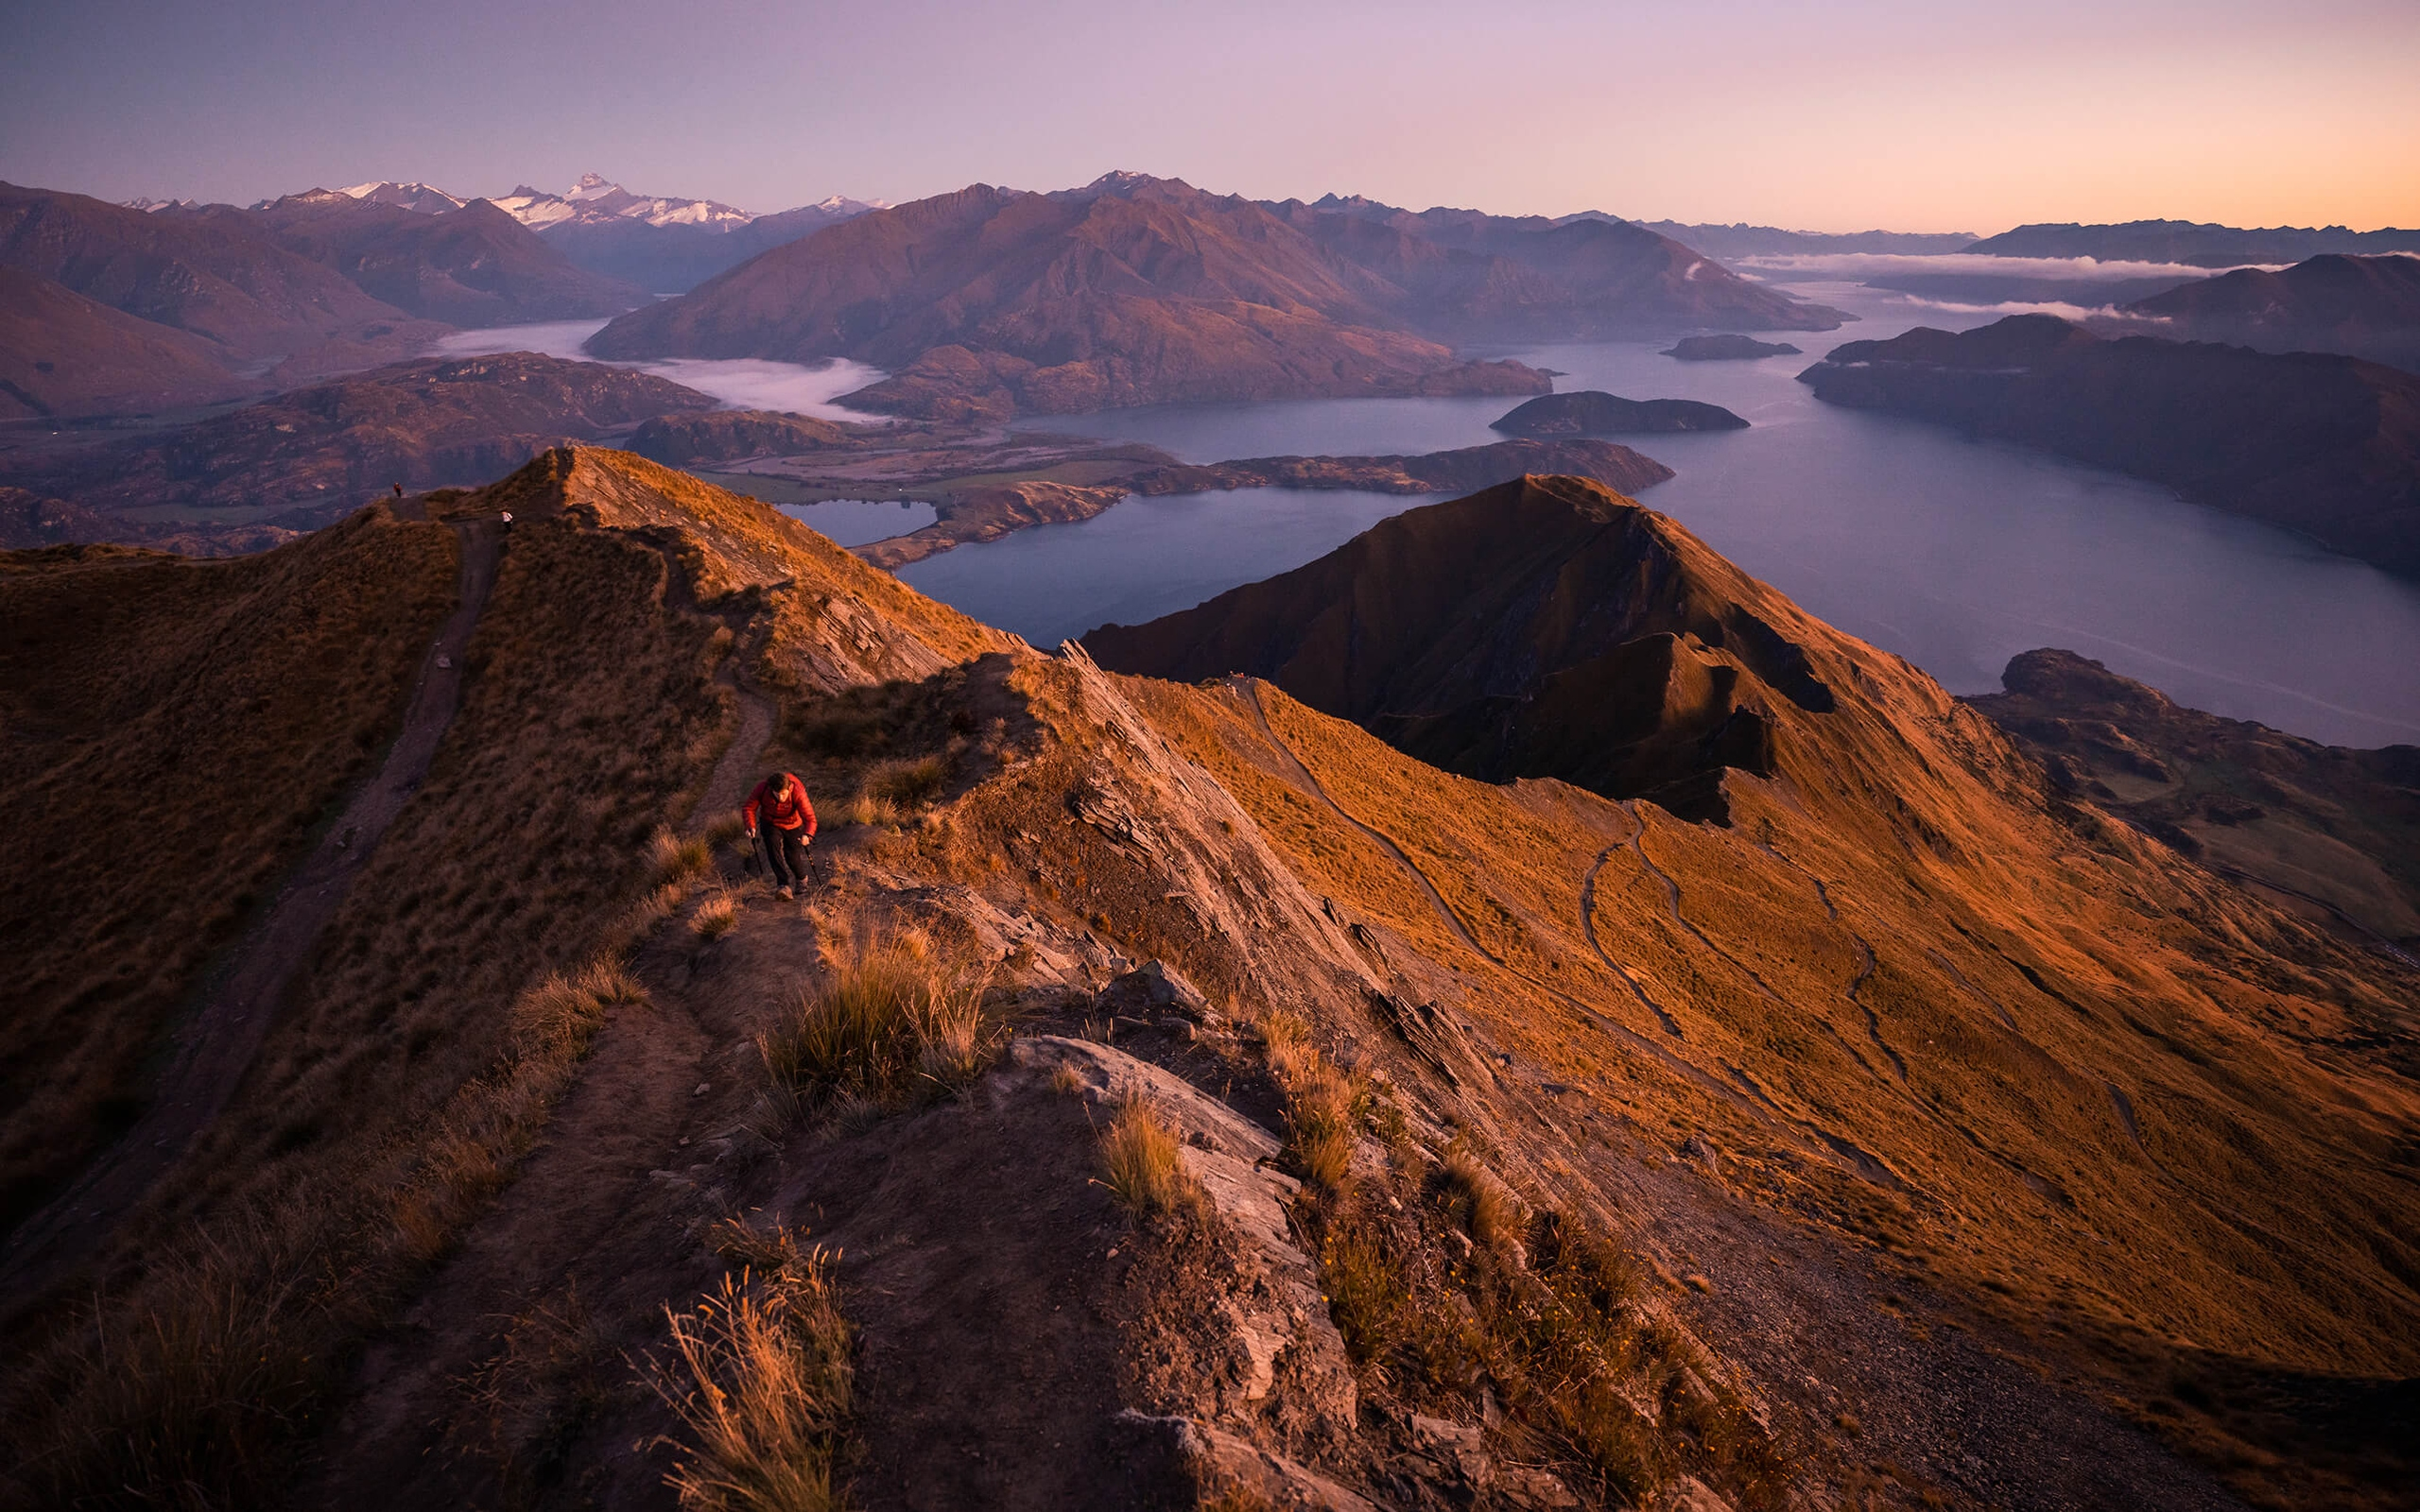 ADAM WEIST  穿越新西兰:从雨林到火山